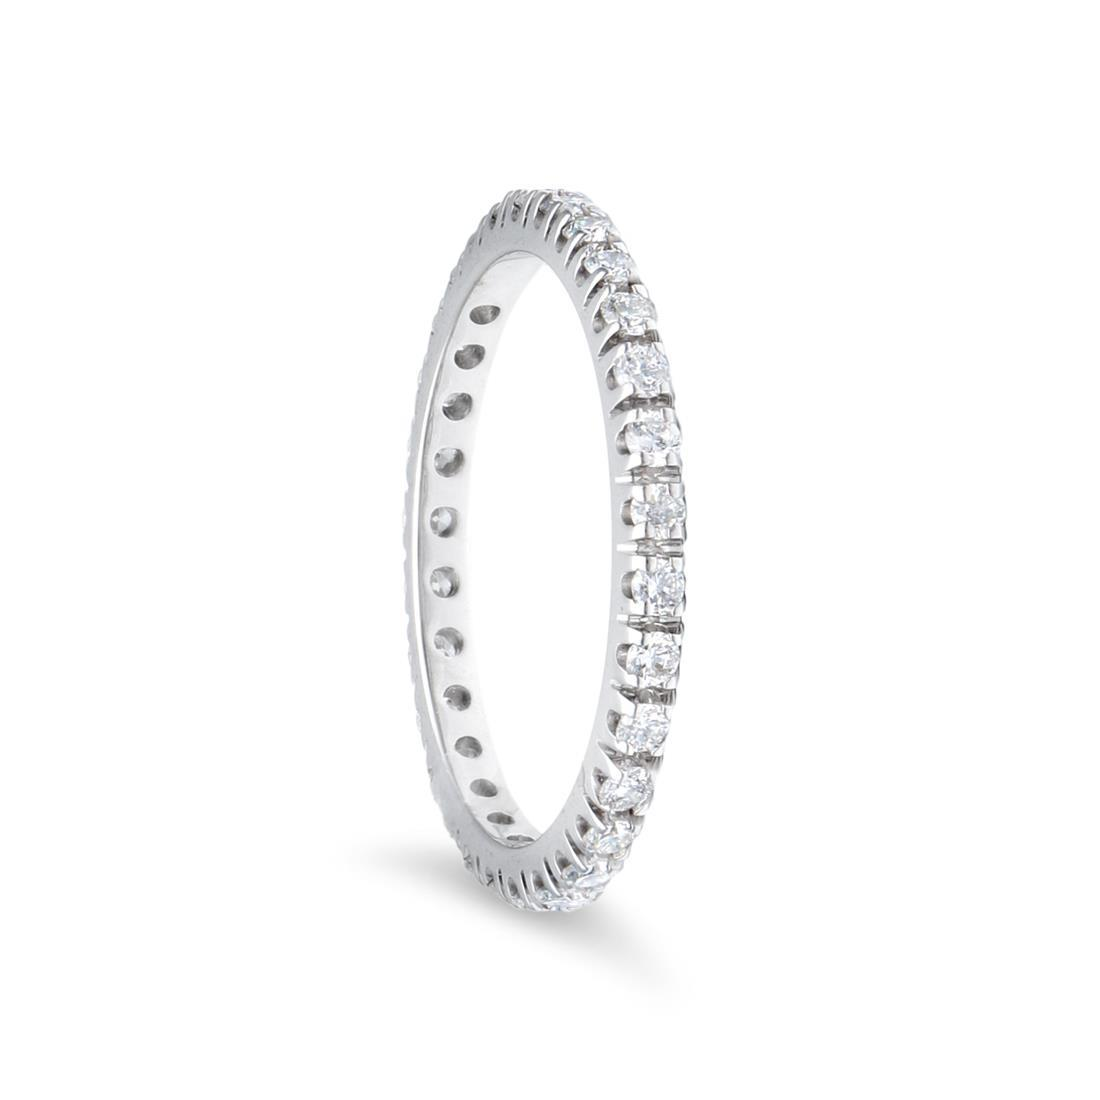 Anello eternity con diamanti - LUXURY ZONE